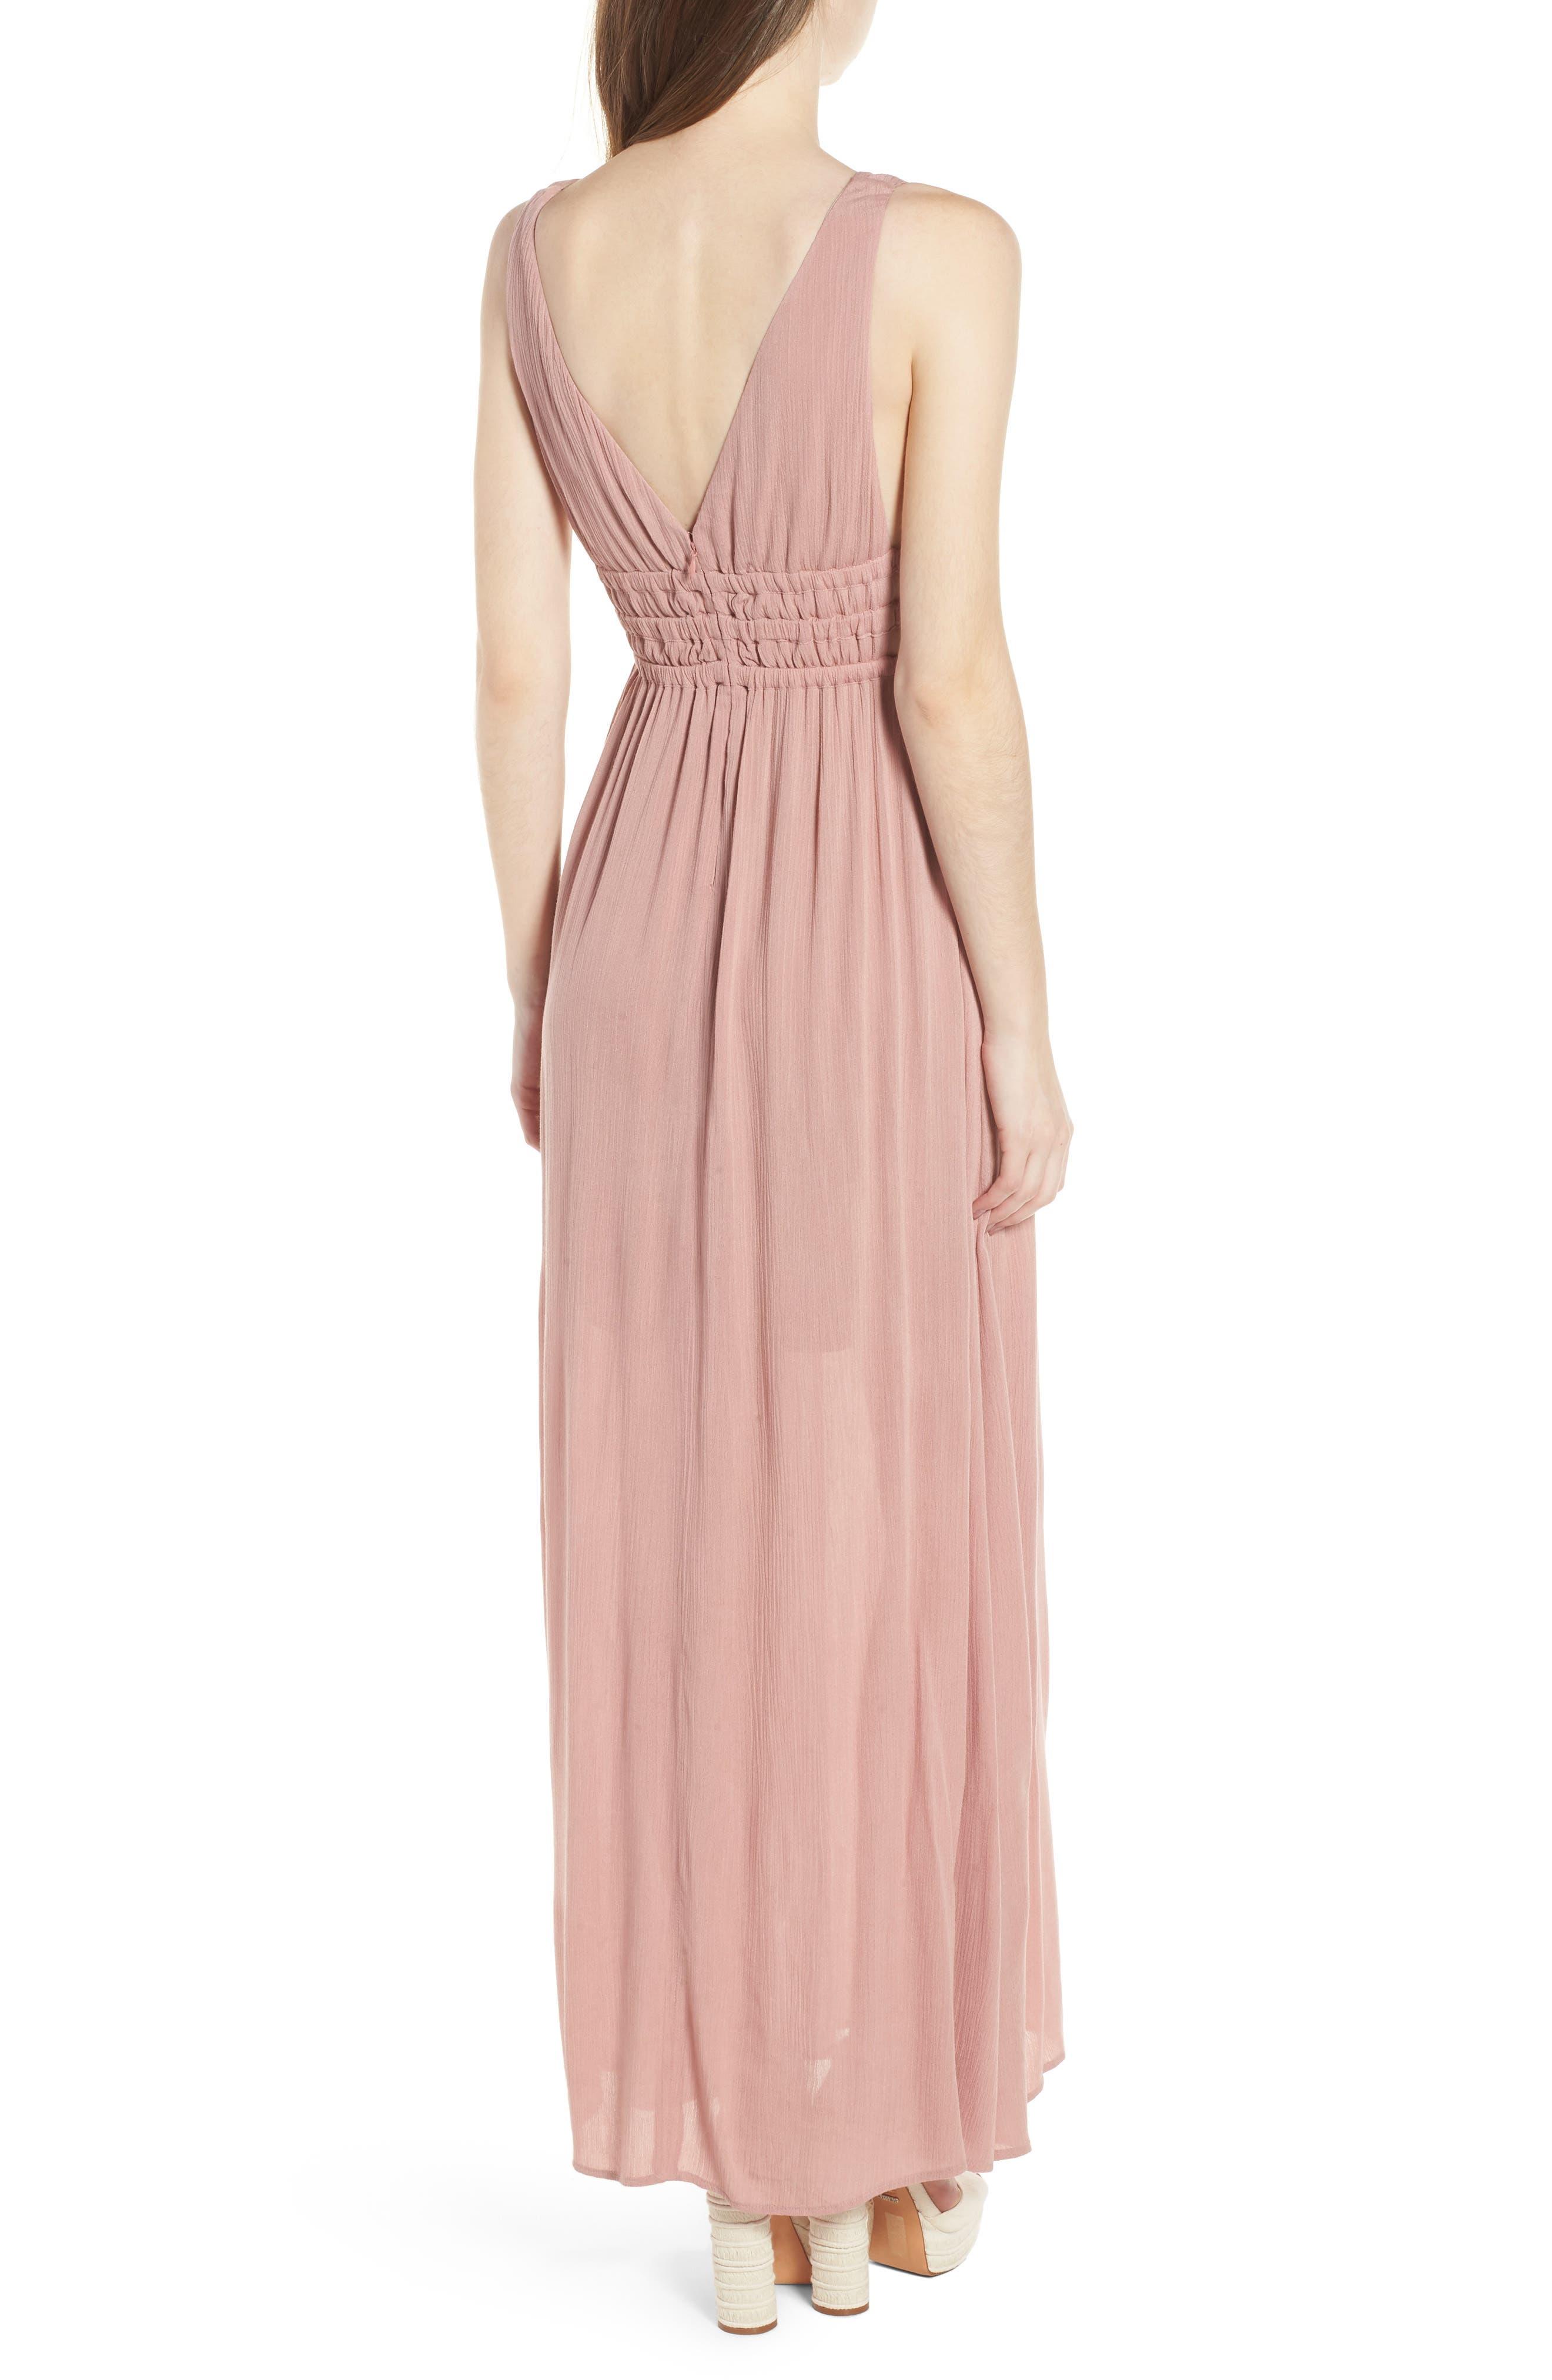 Surrey Maxi Dress,                             Alternate thumbnail 2, color,                             Nude Rose